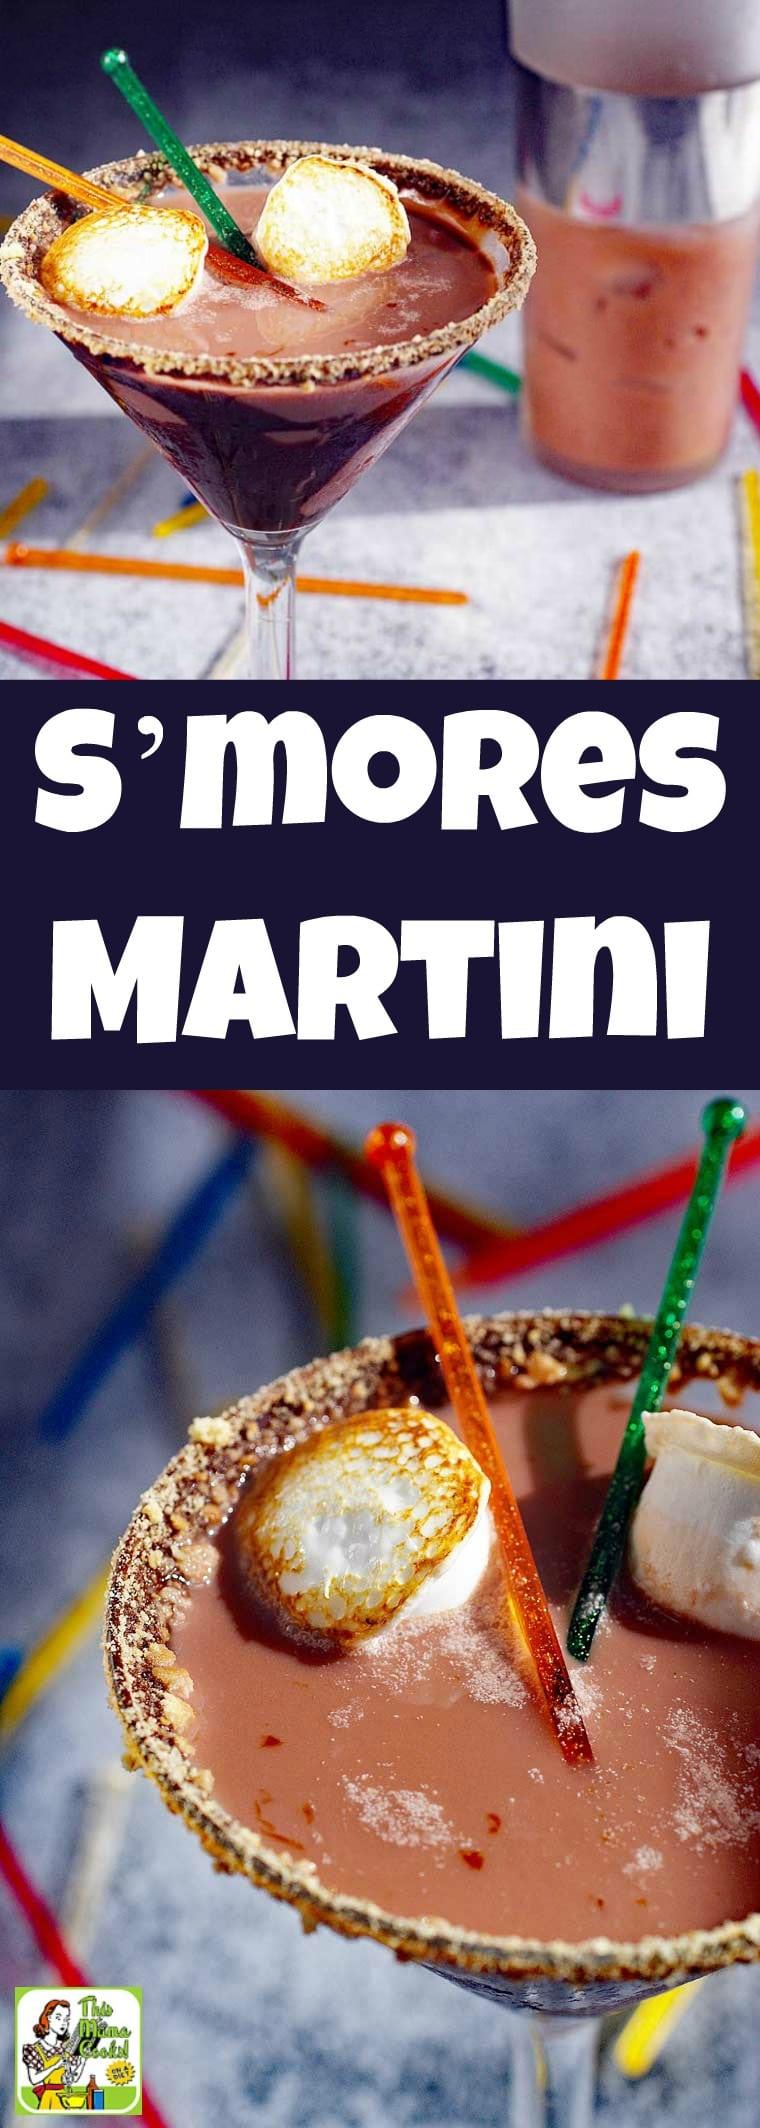 Smores Martini Recipe